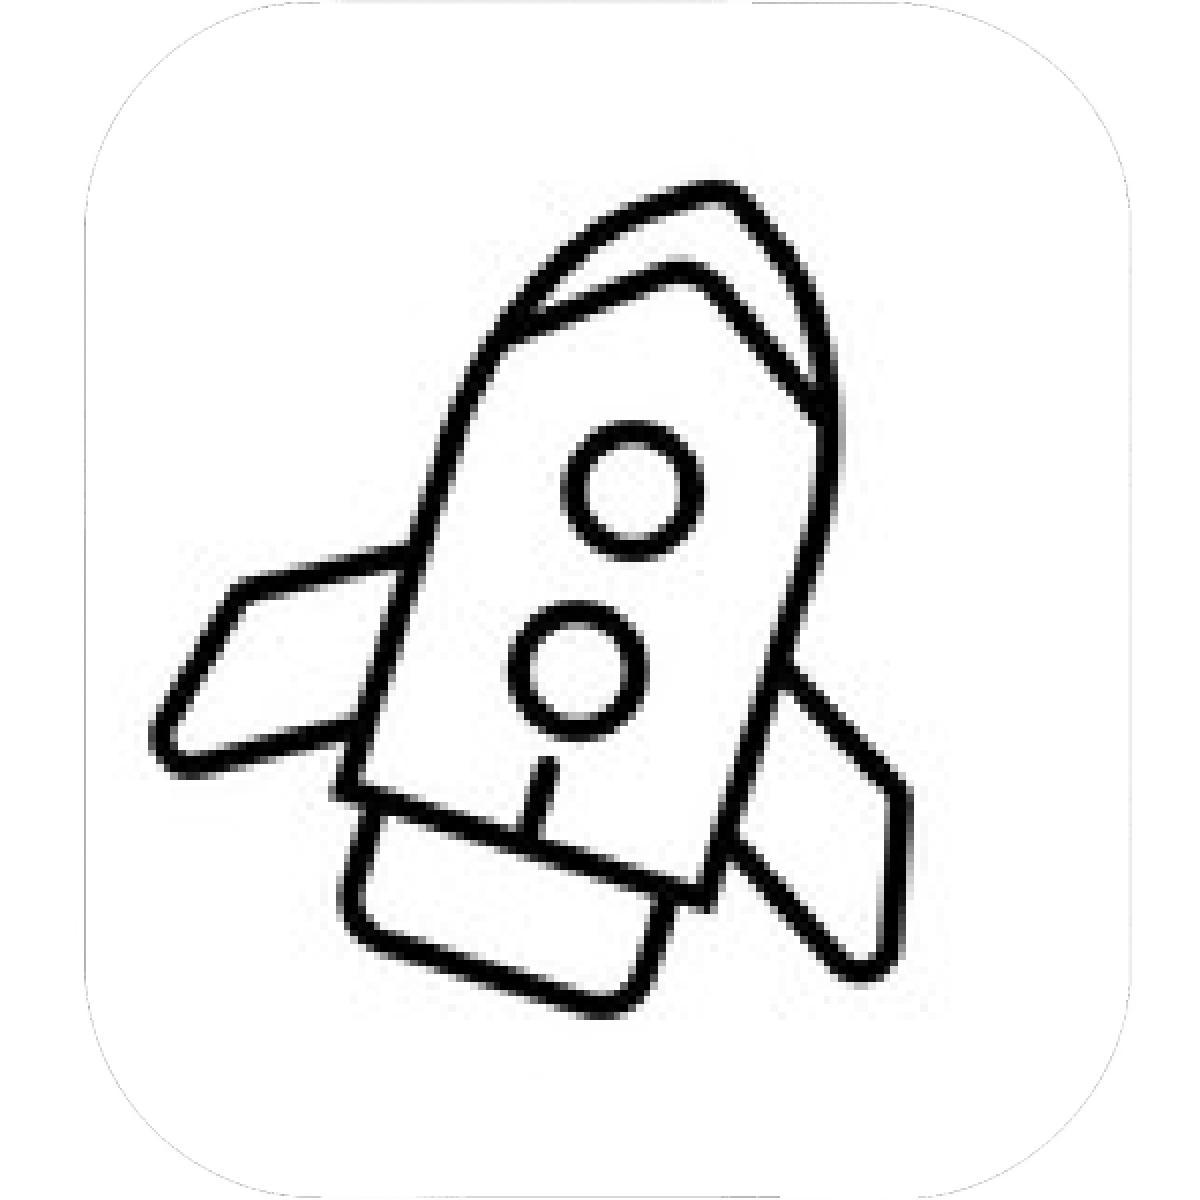 Simple Rocket Ship Drawing